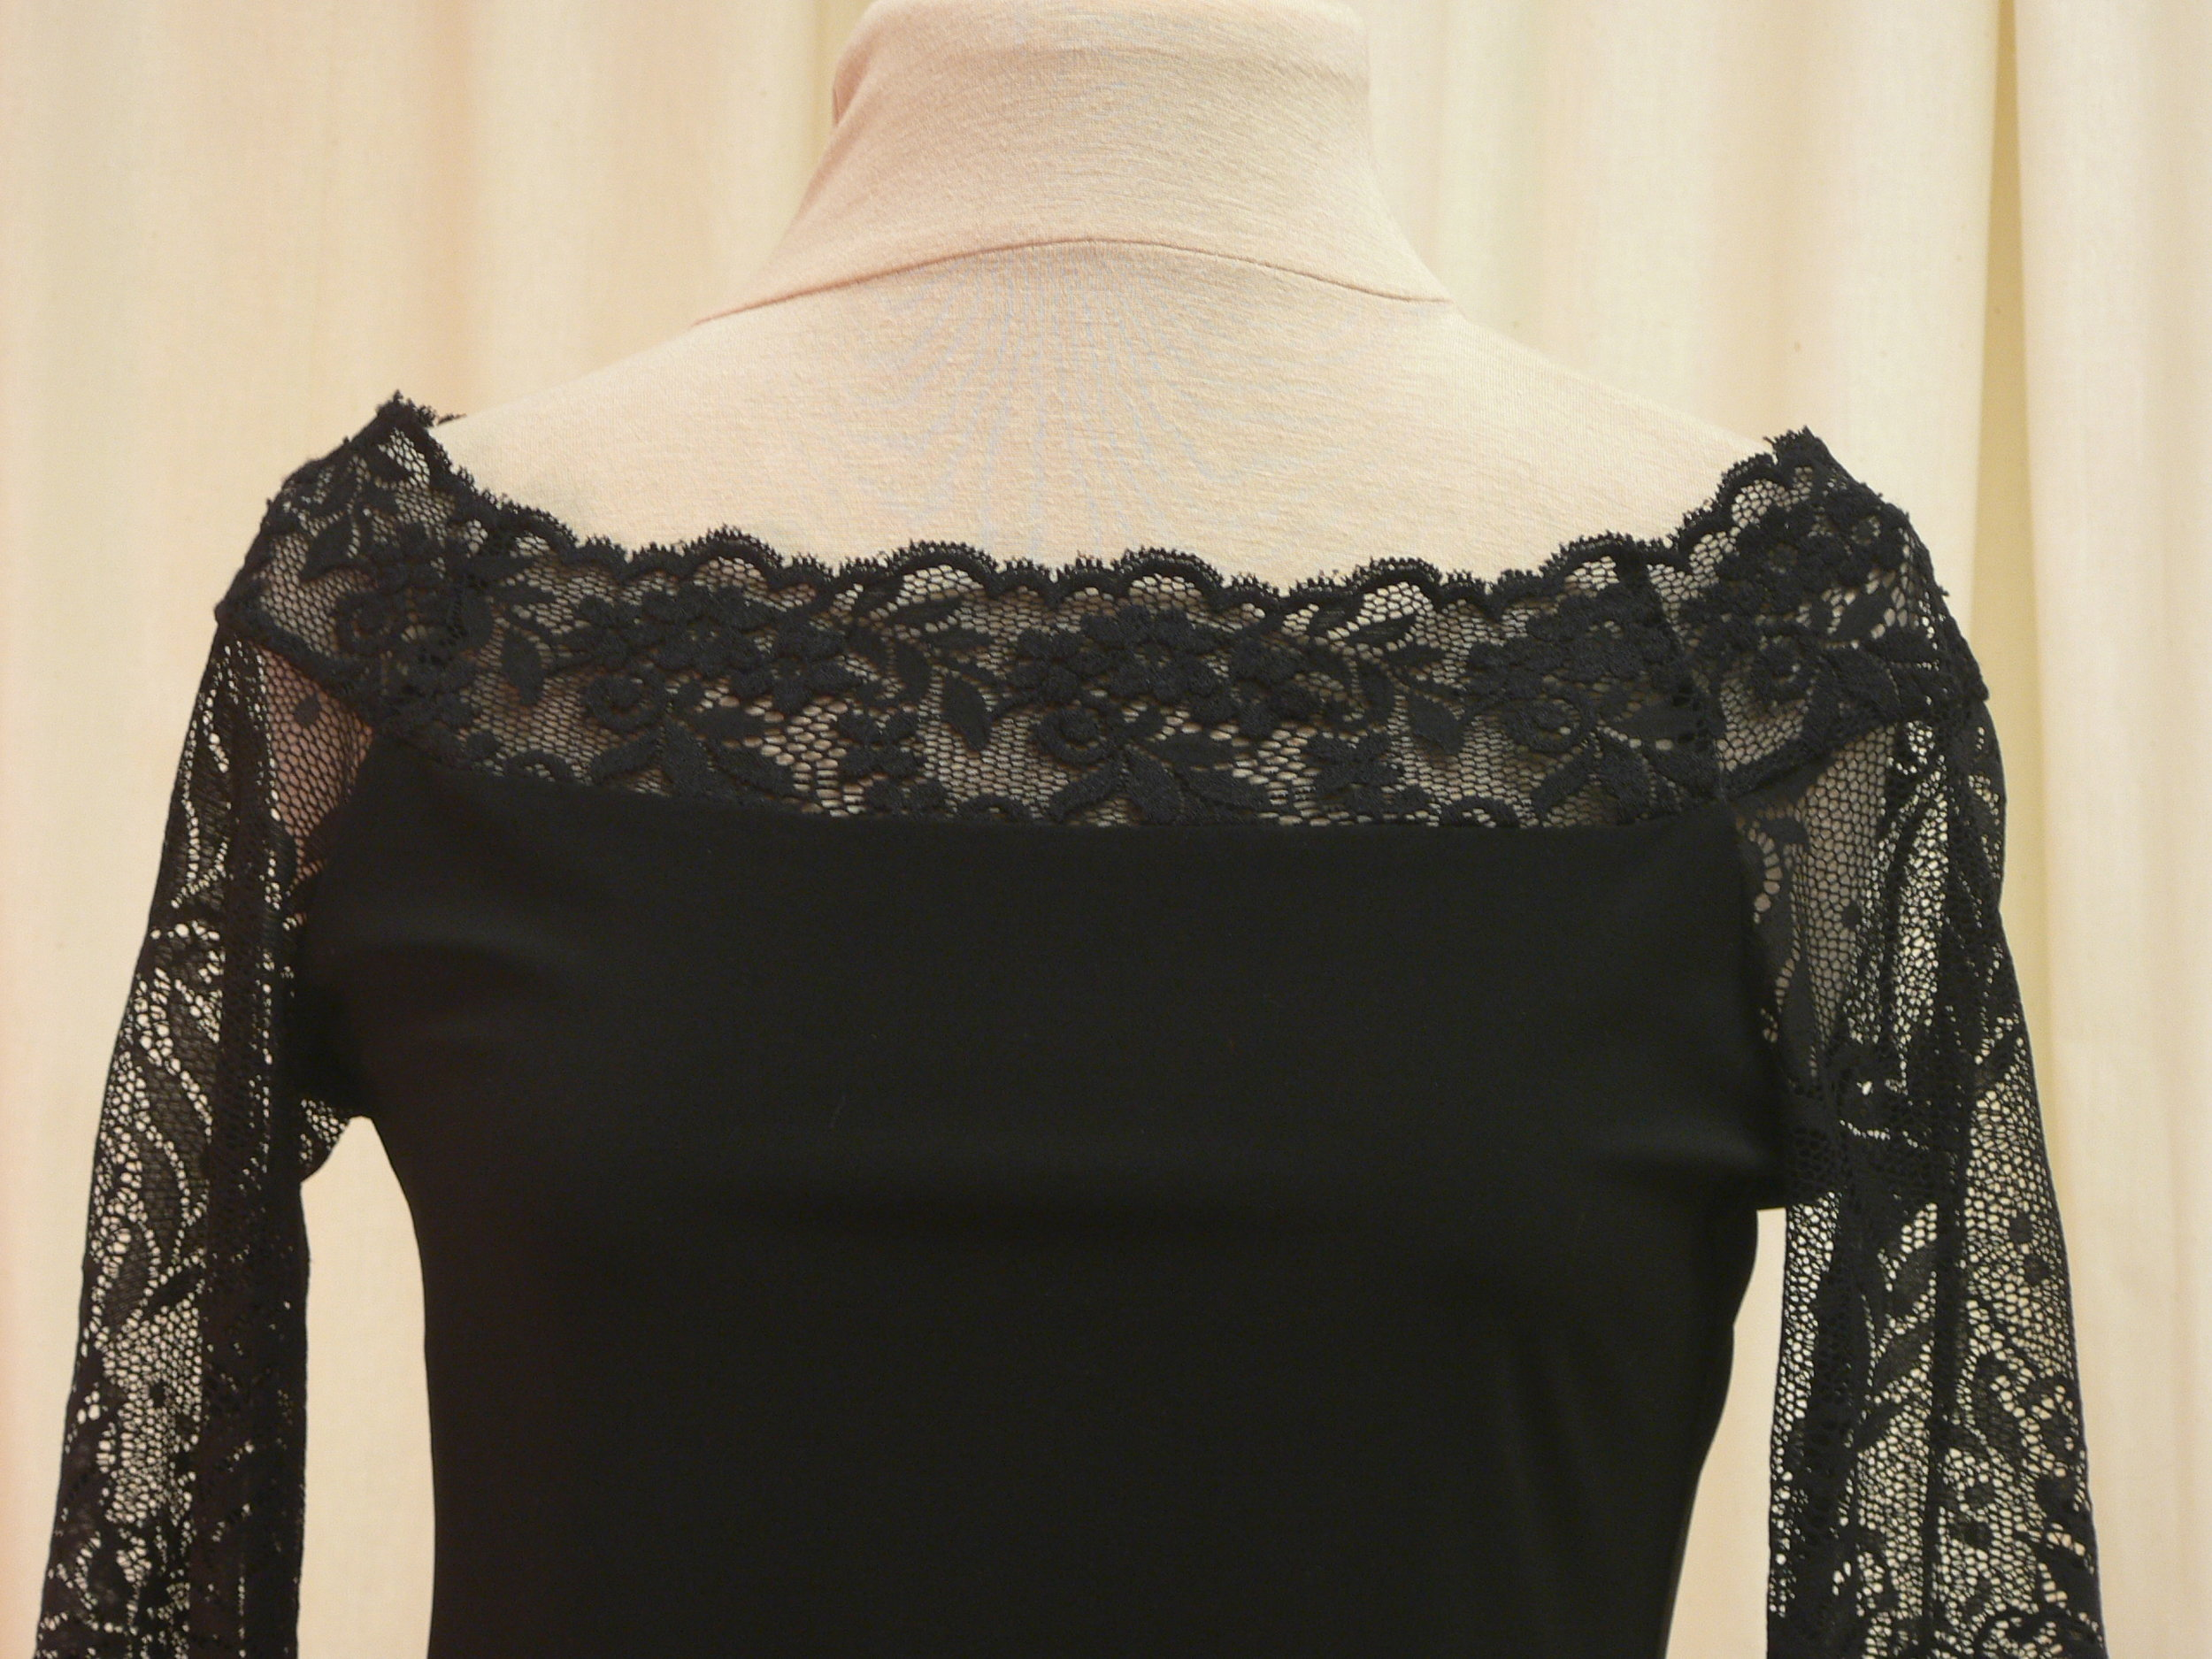 blouse14_front_detail.JPG